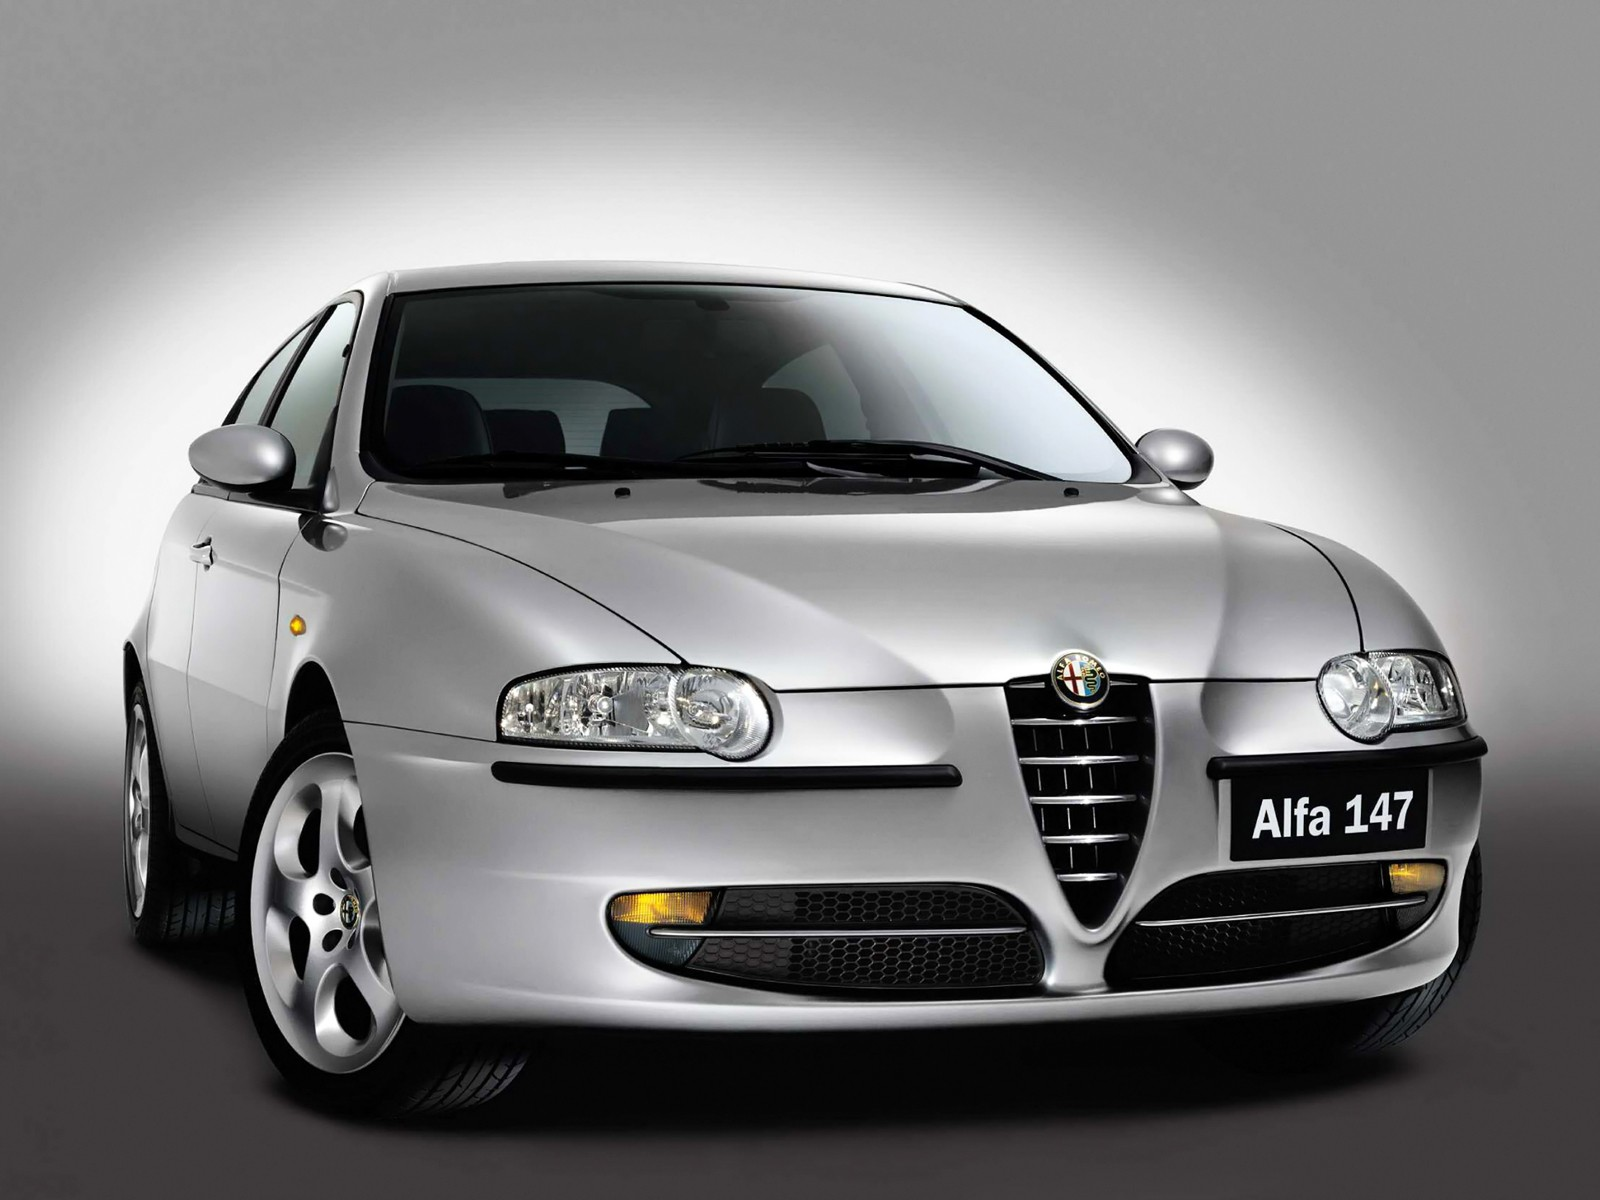 alfa romeo 147 5 doors specs photos 2000 2001 2002 2003 2004 2005 autoevolution. Black Bedroom Furniture Sets. Home Design Ideas